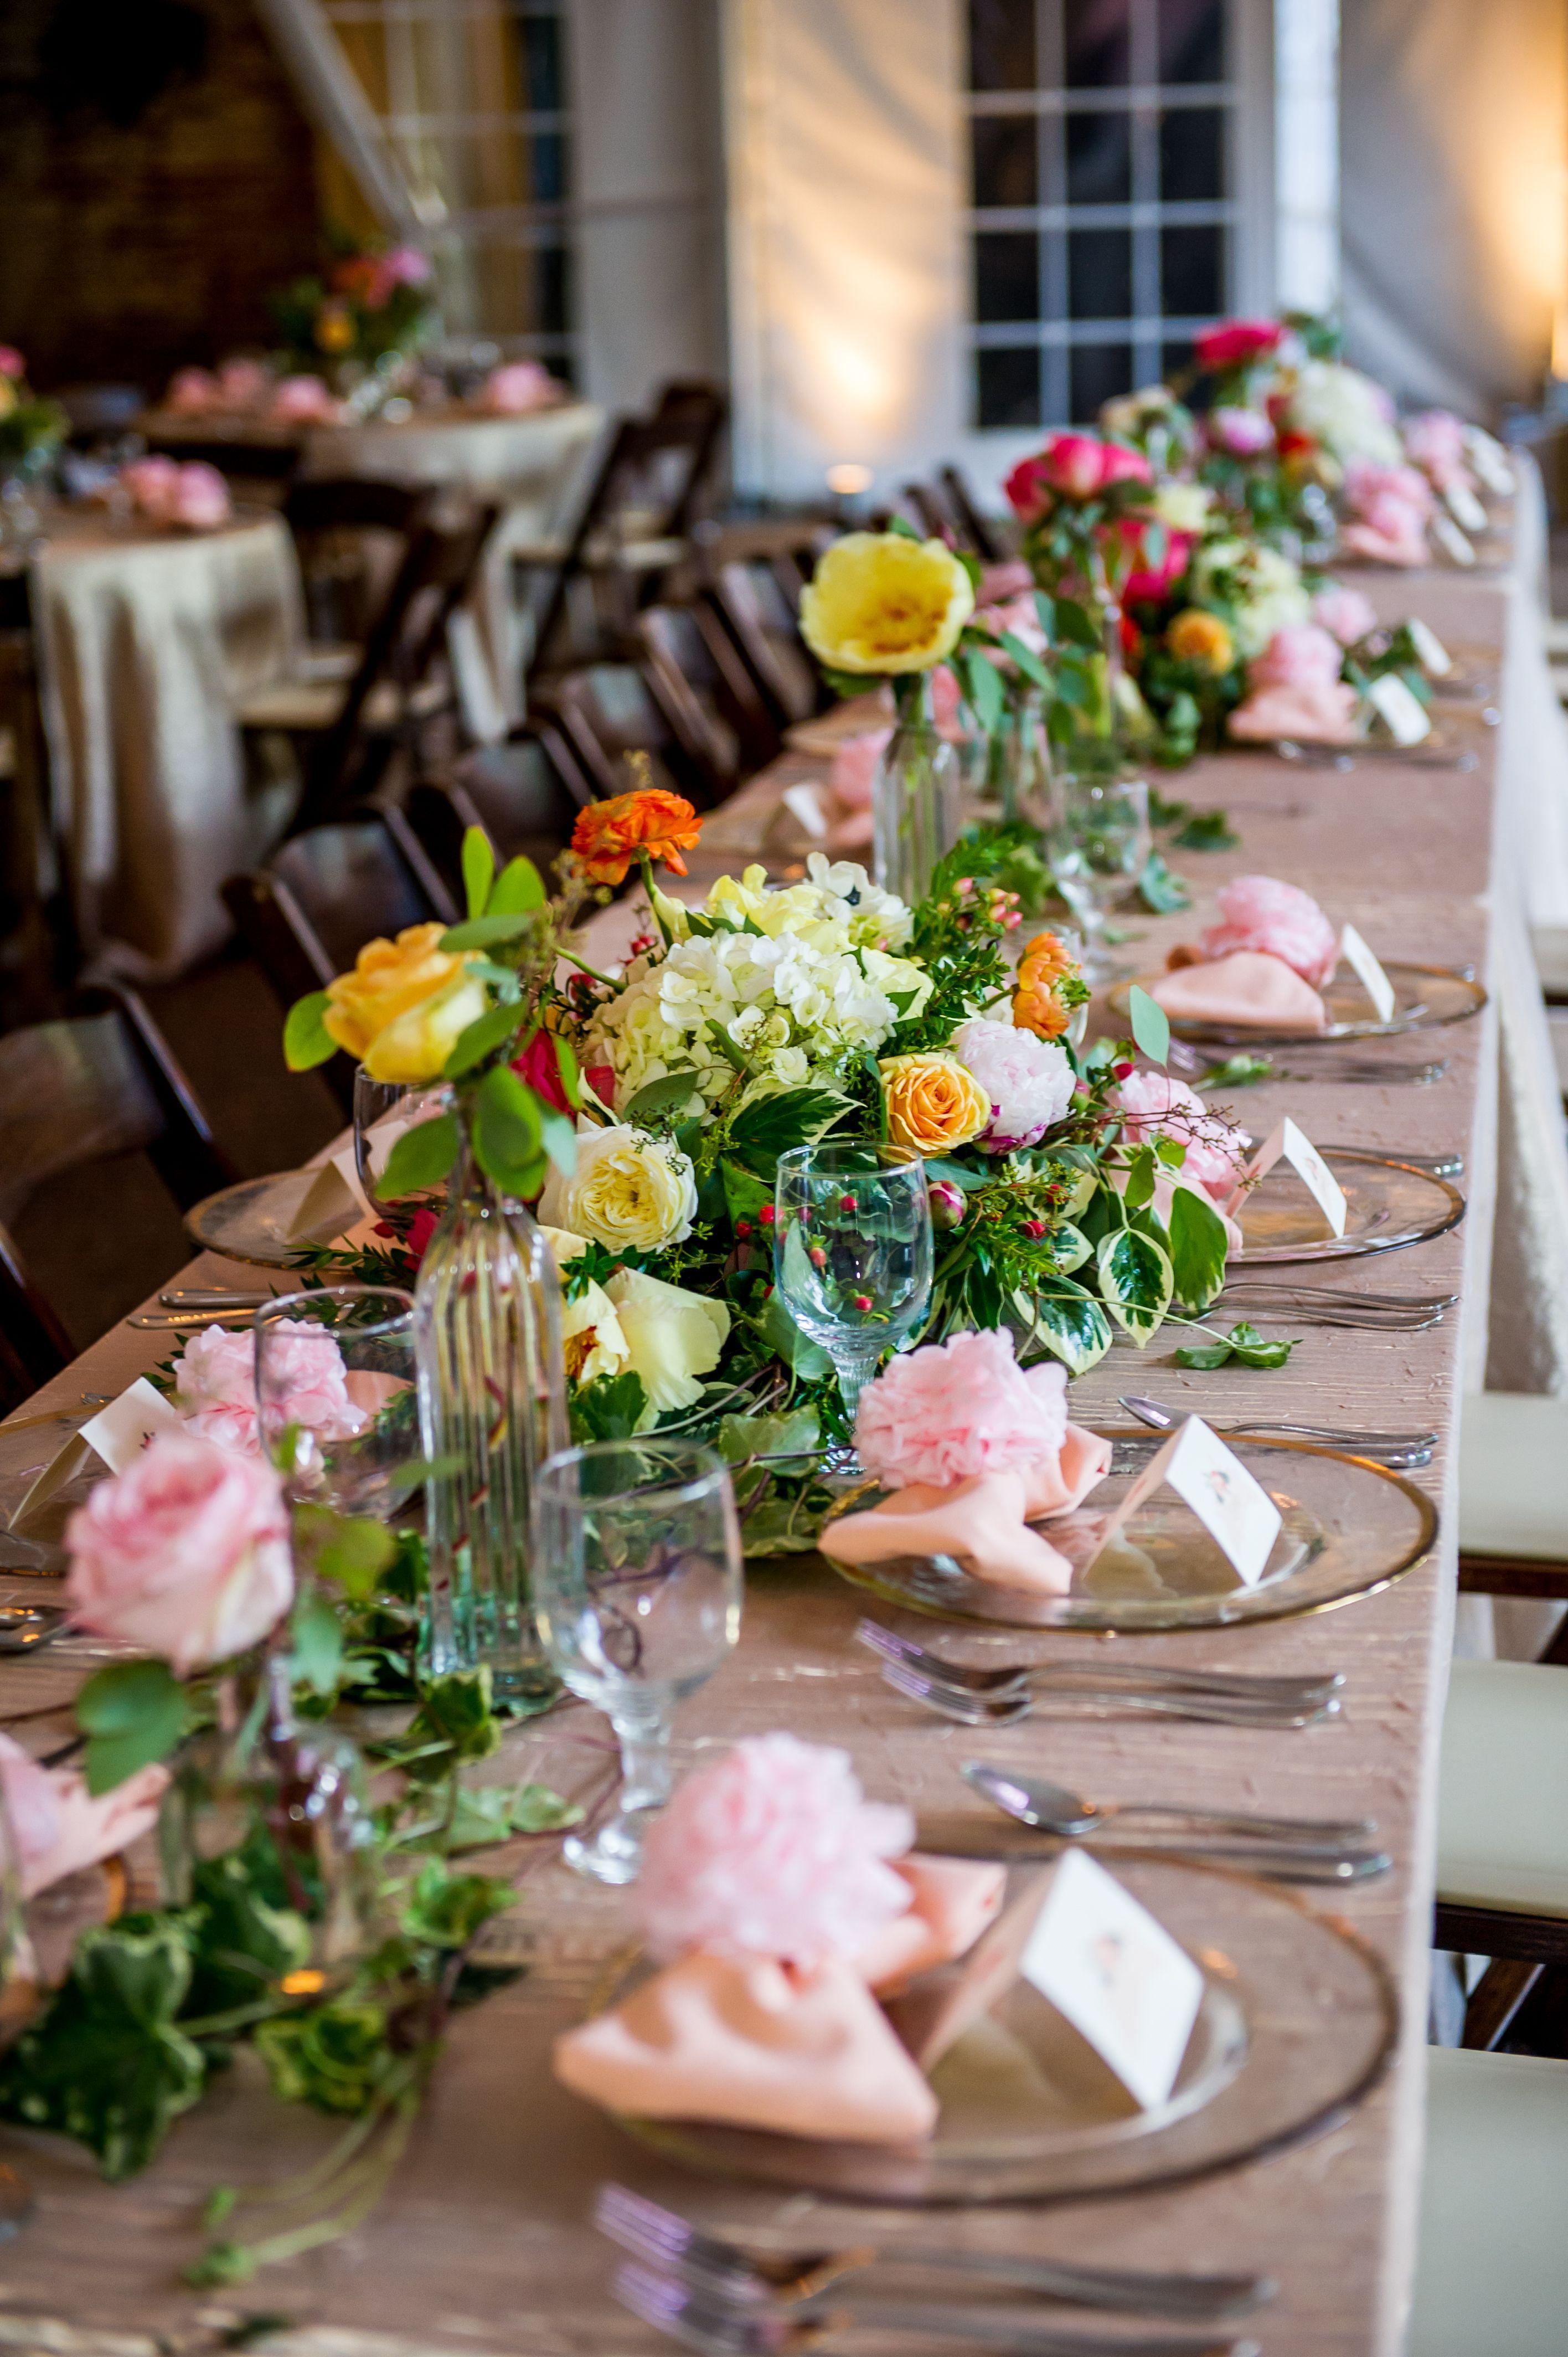 Lovely Tablescape for Wedding Reception @ riverwoodmansion.com | http://enchantedfloristtn.com/ | http://www.acephotographs.com/